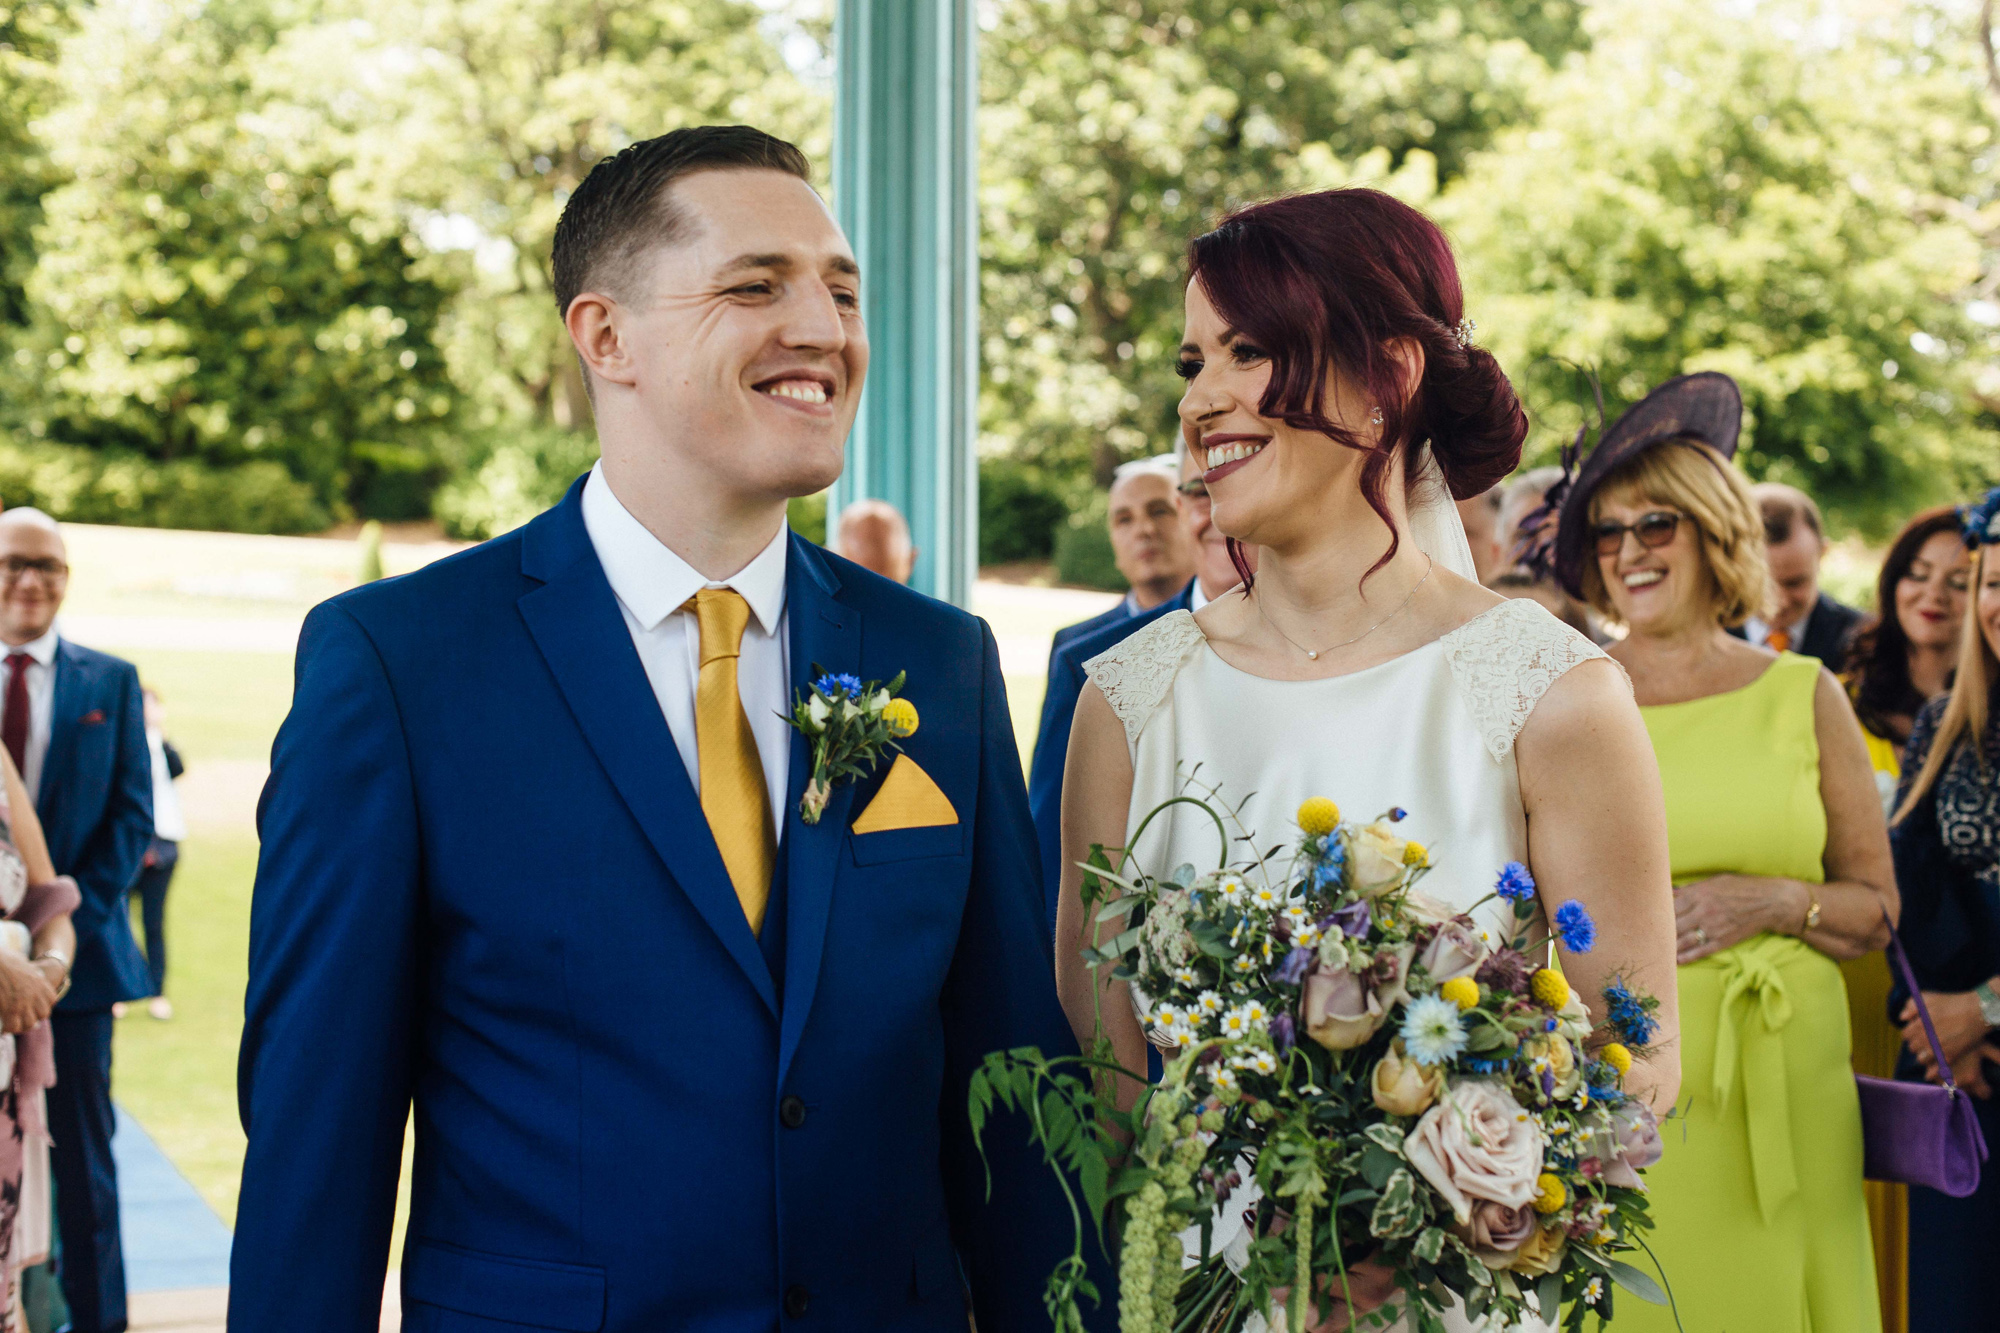 Sarah-Honeysuckle-Bias-Cut-Silk-Vintage-Inspired-Wedding-Gown-Sheffield-Wedding-Kate-Beaumont-15.jpg